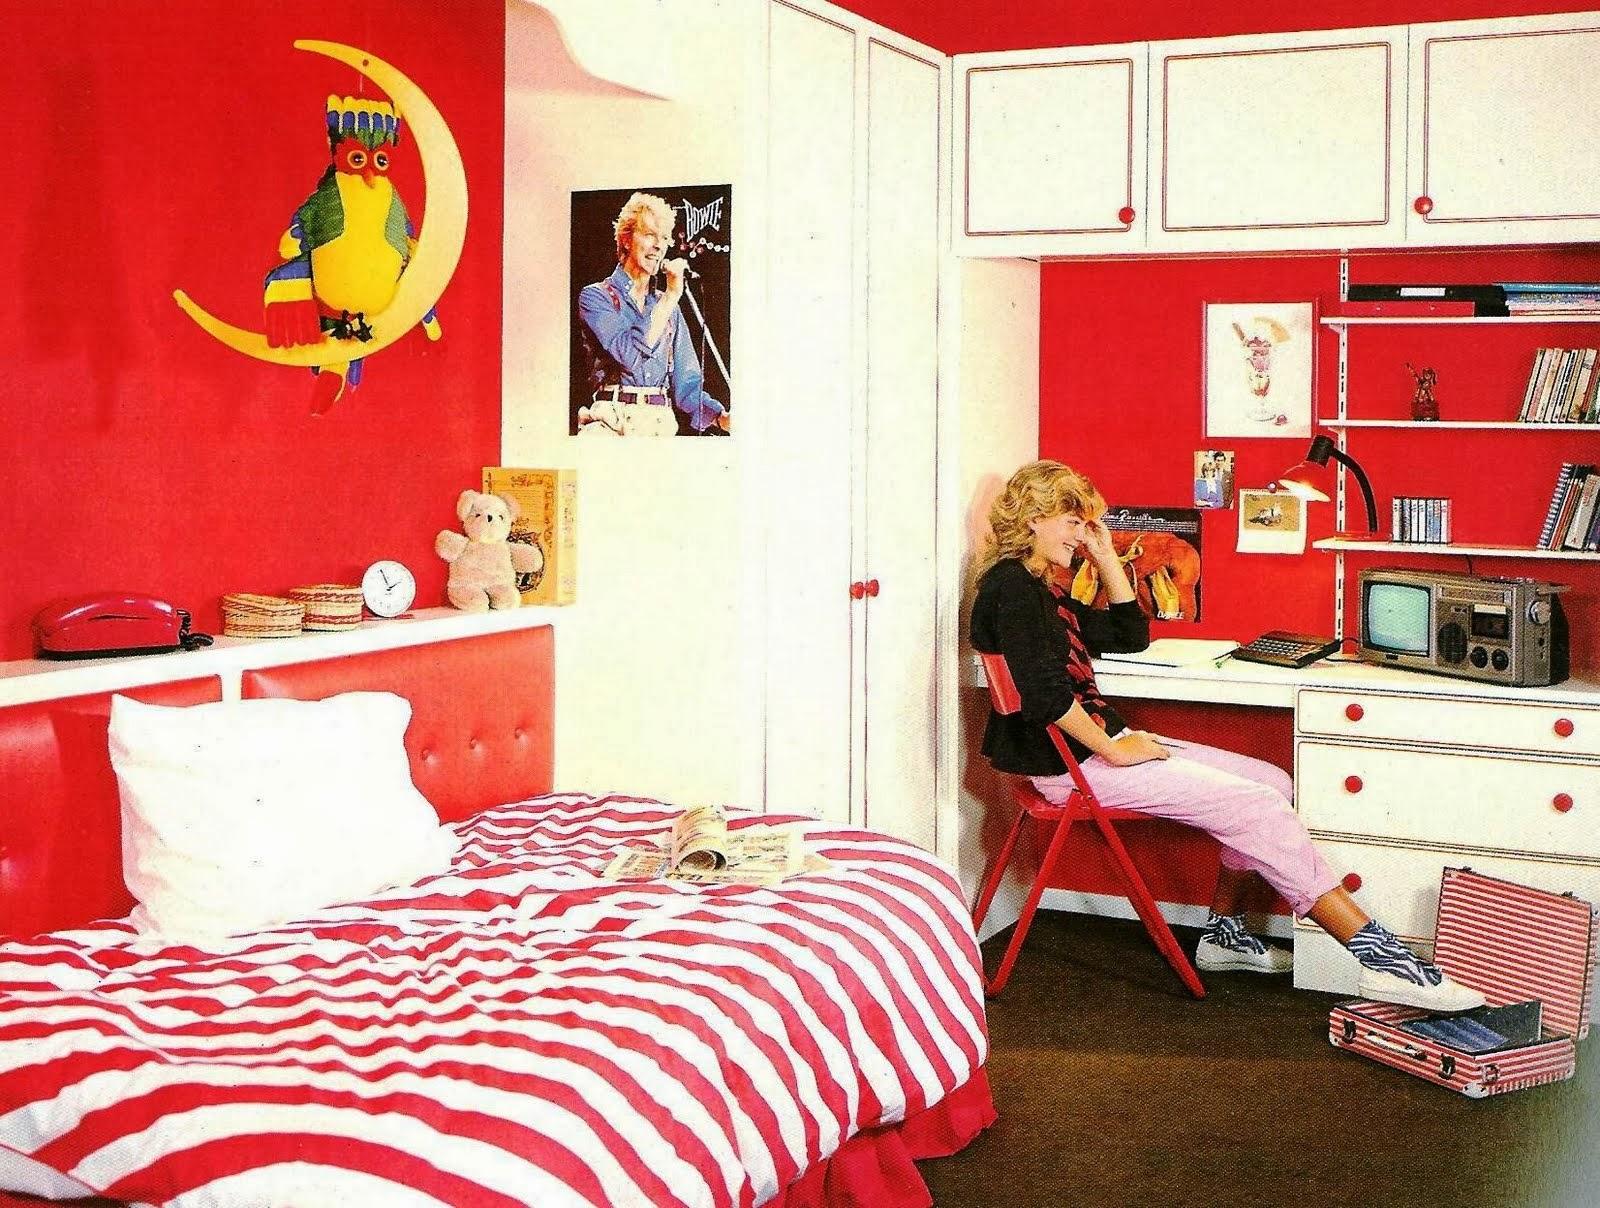 fashion decor for bedrooms korean interior d house free d house fashion designer bedroom theme - Fashion Designer Bedroom Theme